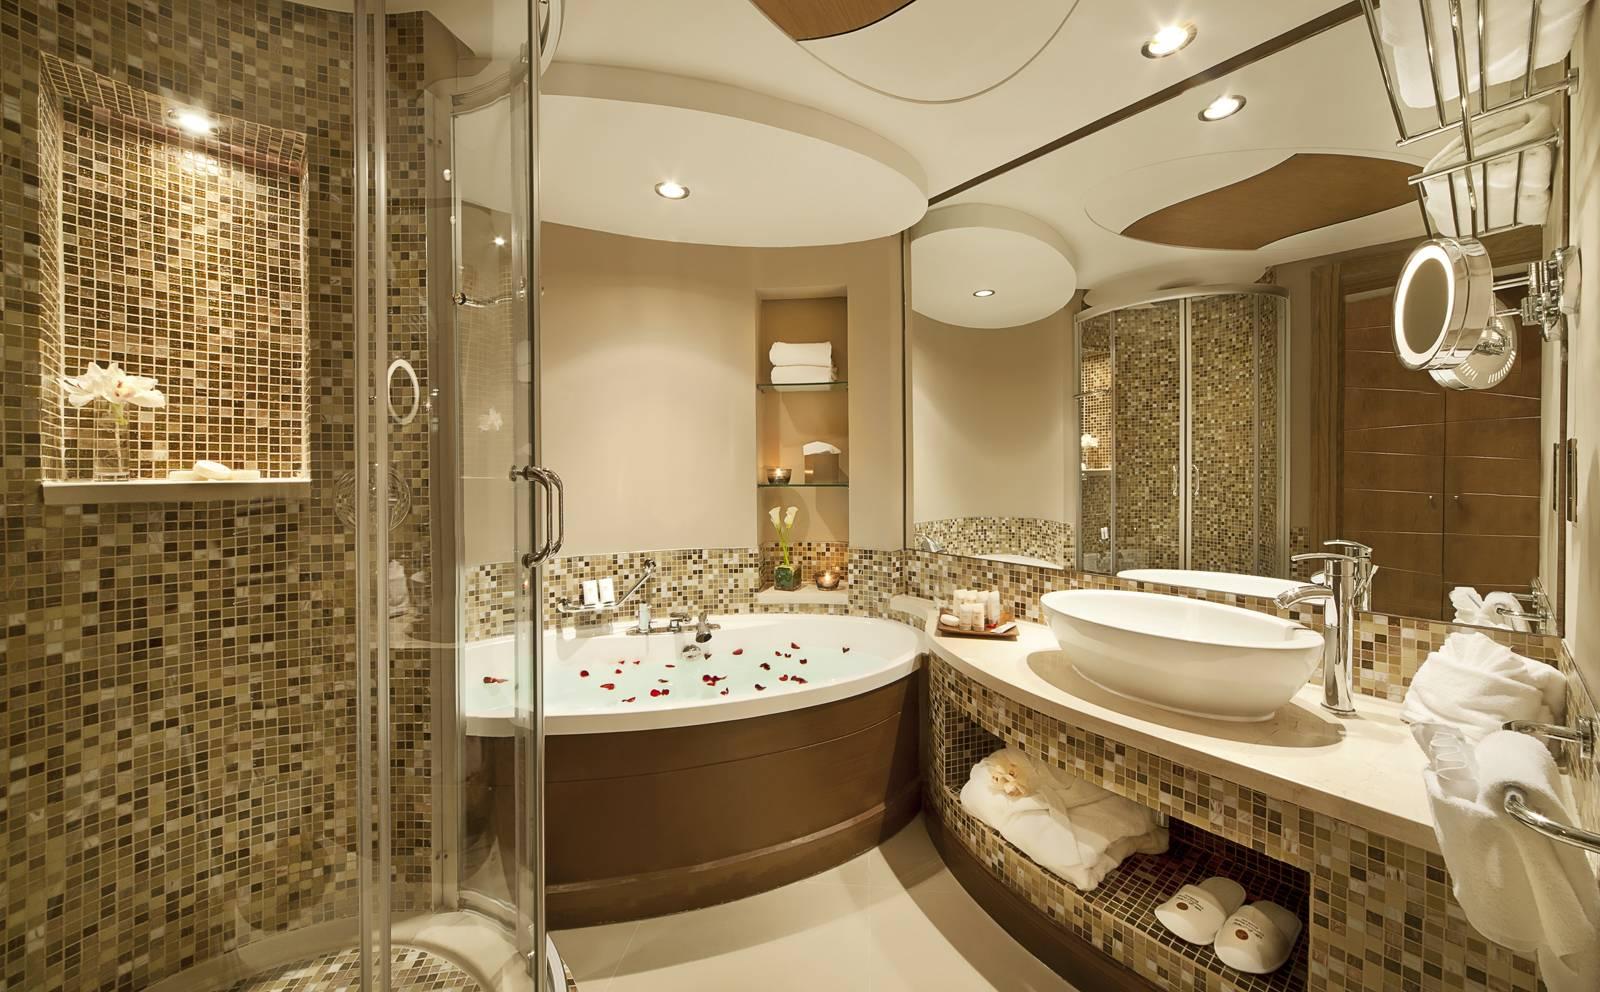 Ванная комната дизайн с мозаикой